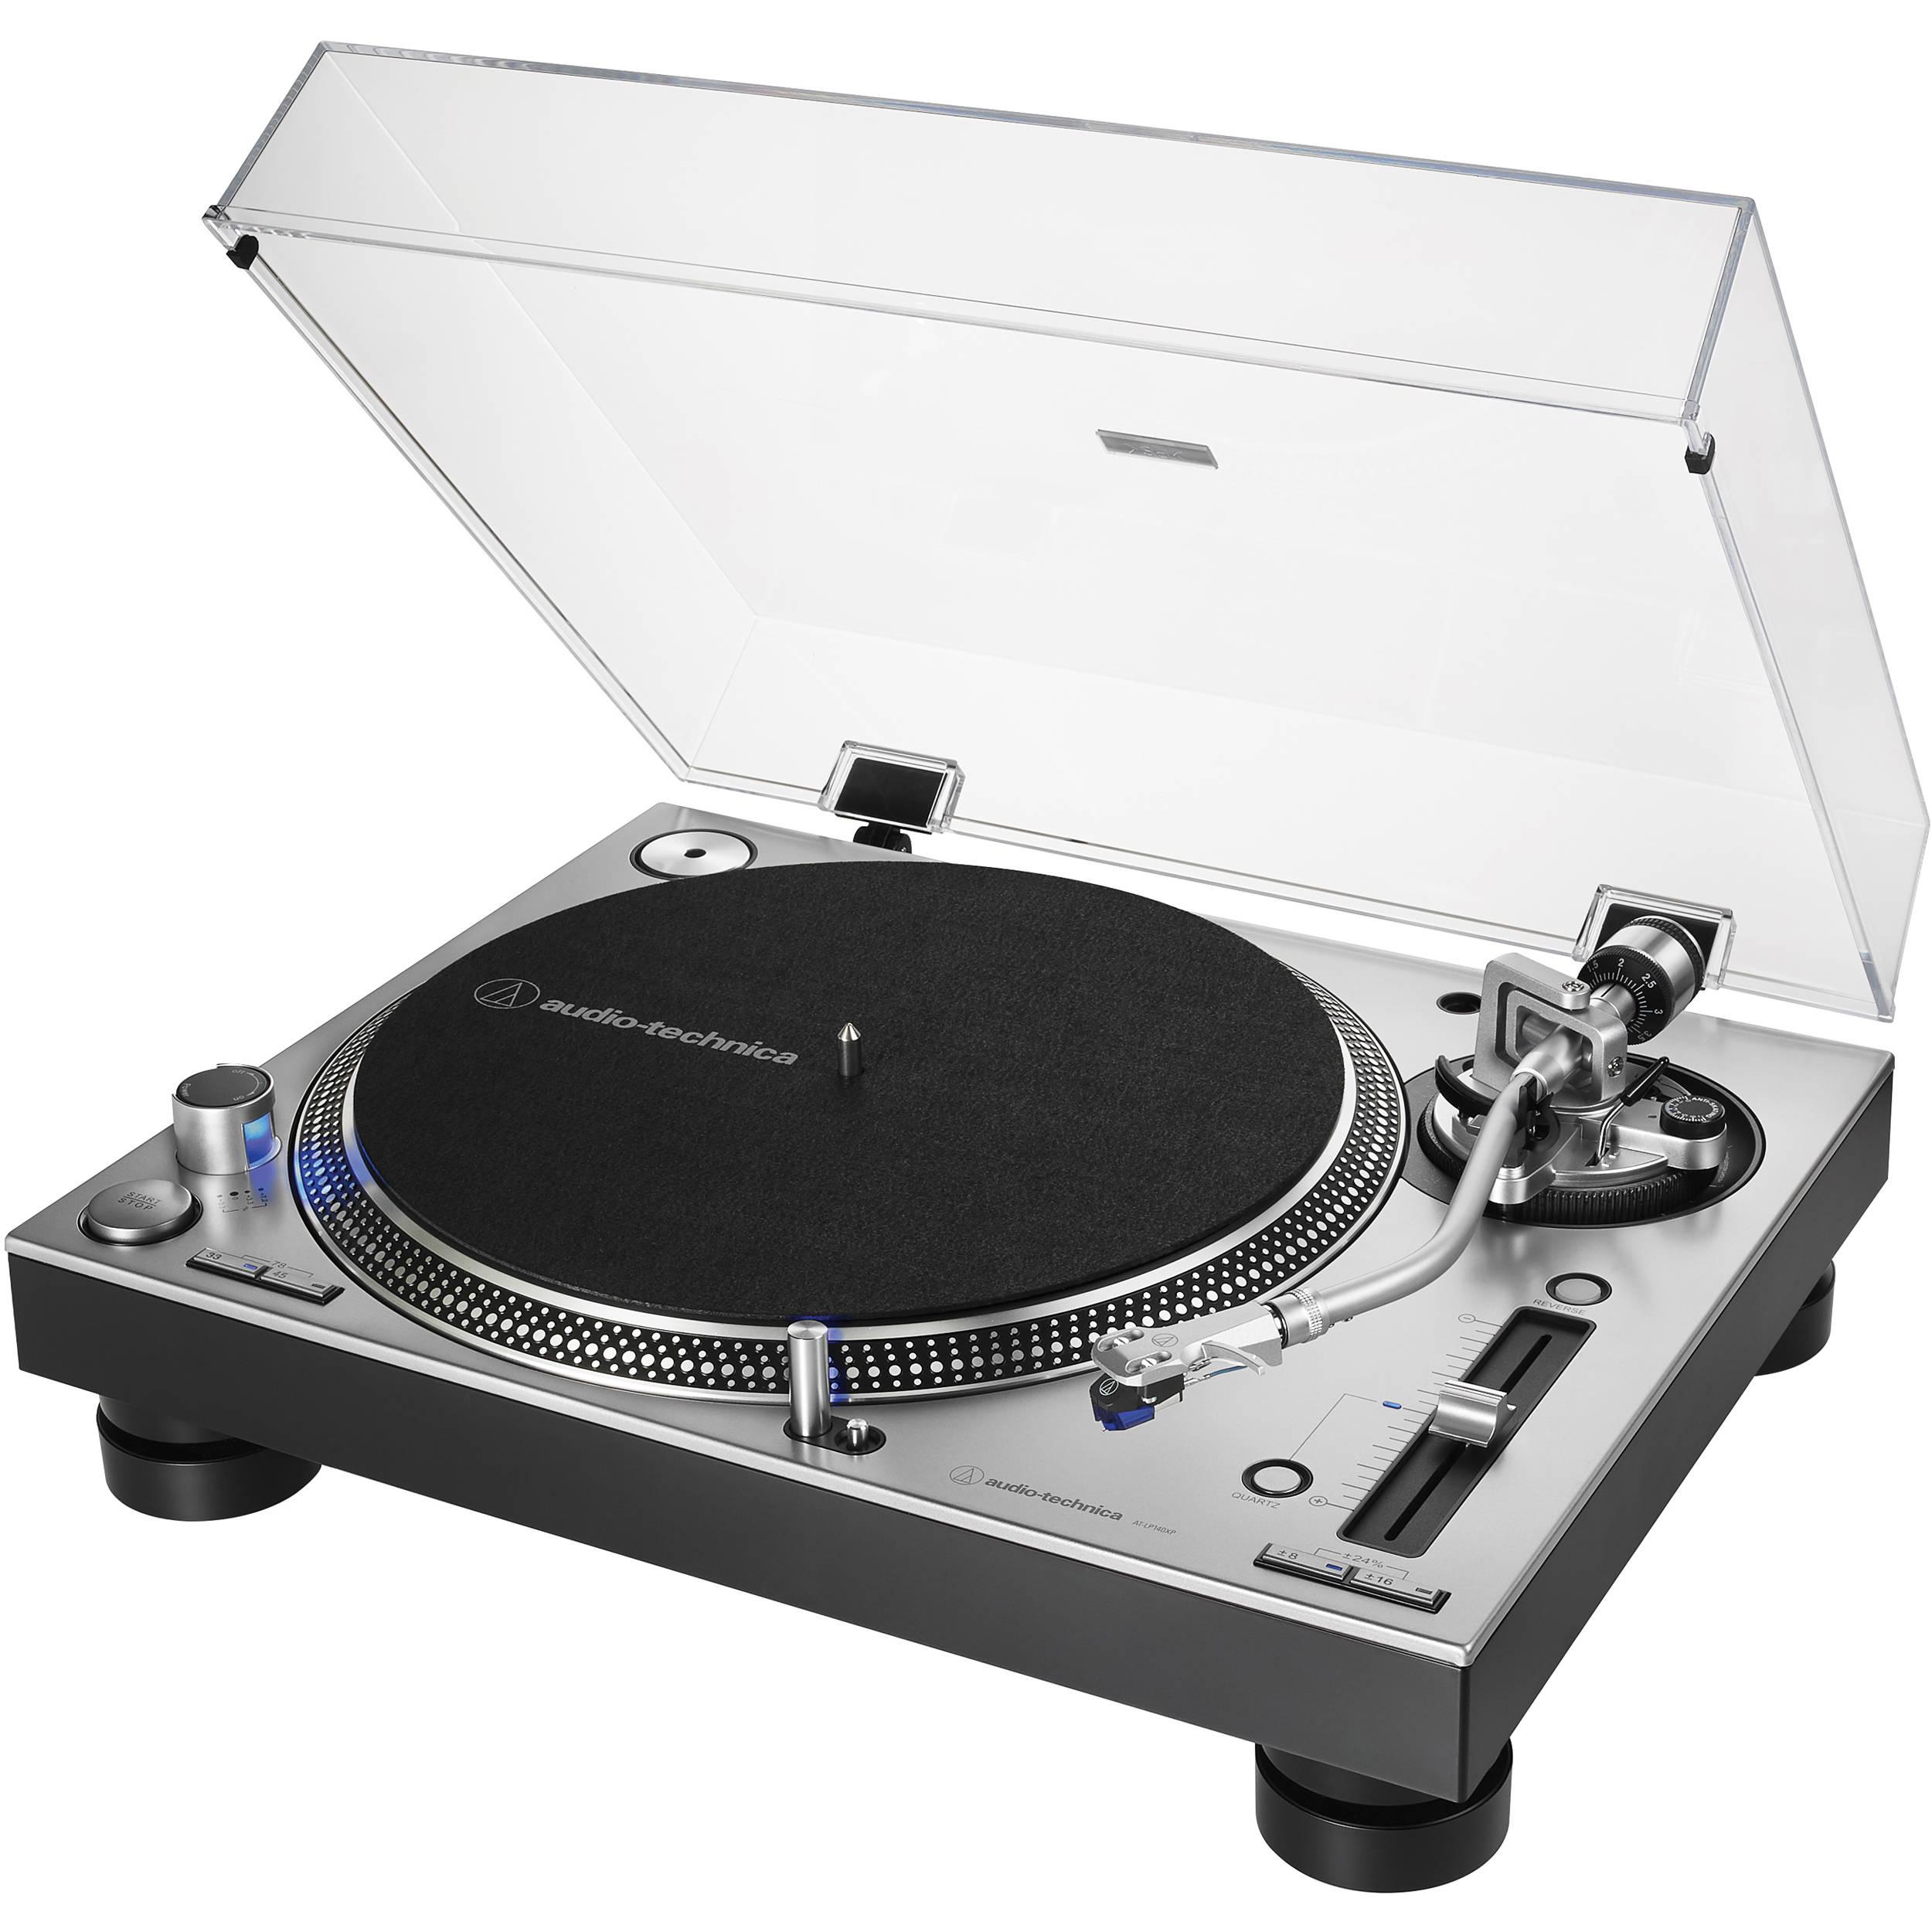 Audio-Technica Consumer AT-LP140XP Direct Drive Professional DJ Turntable  (Black)